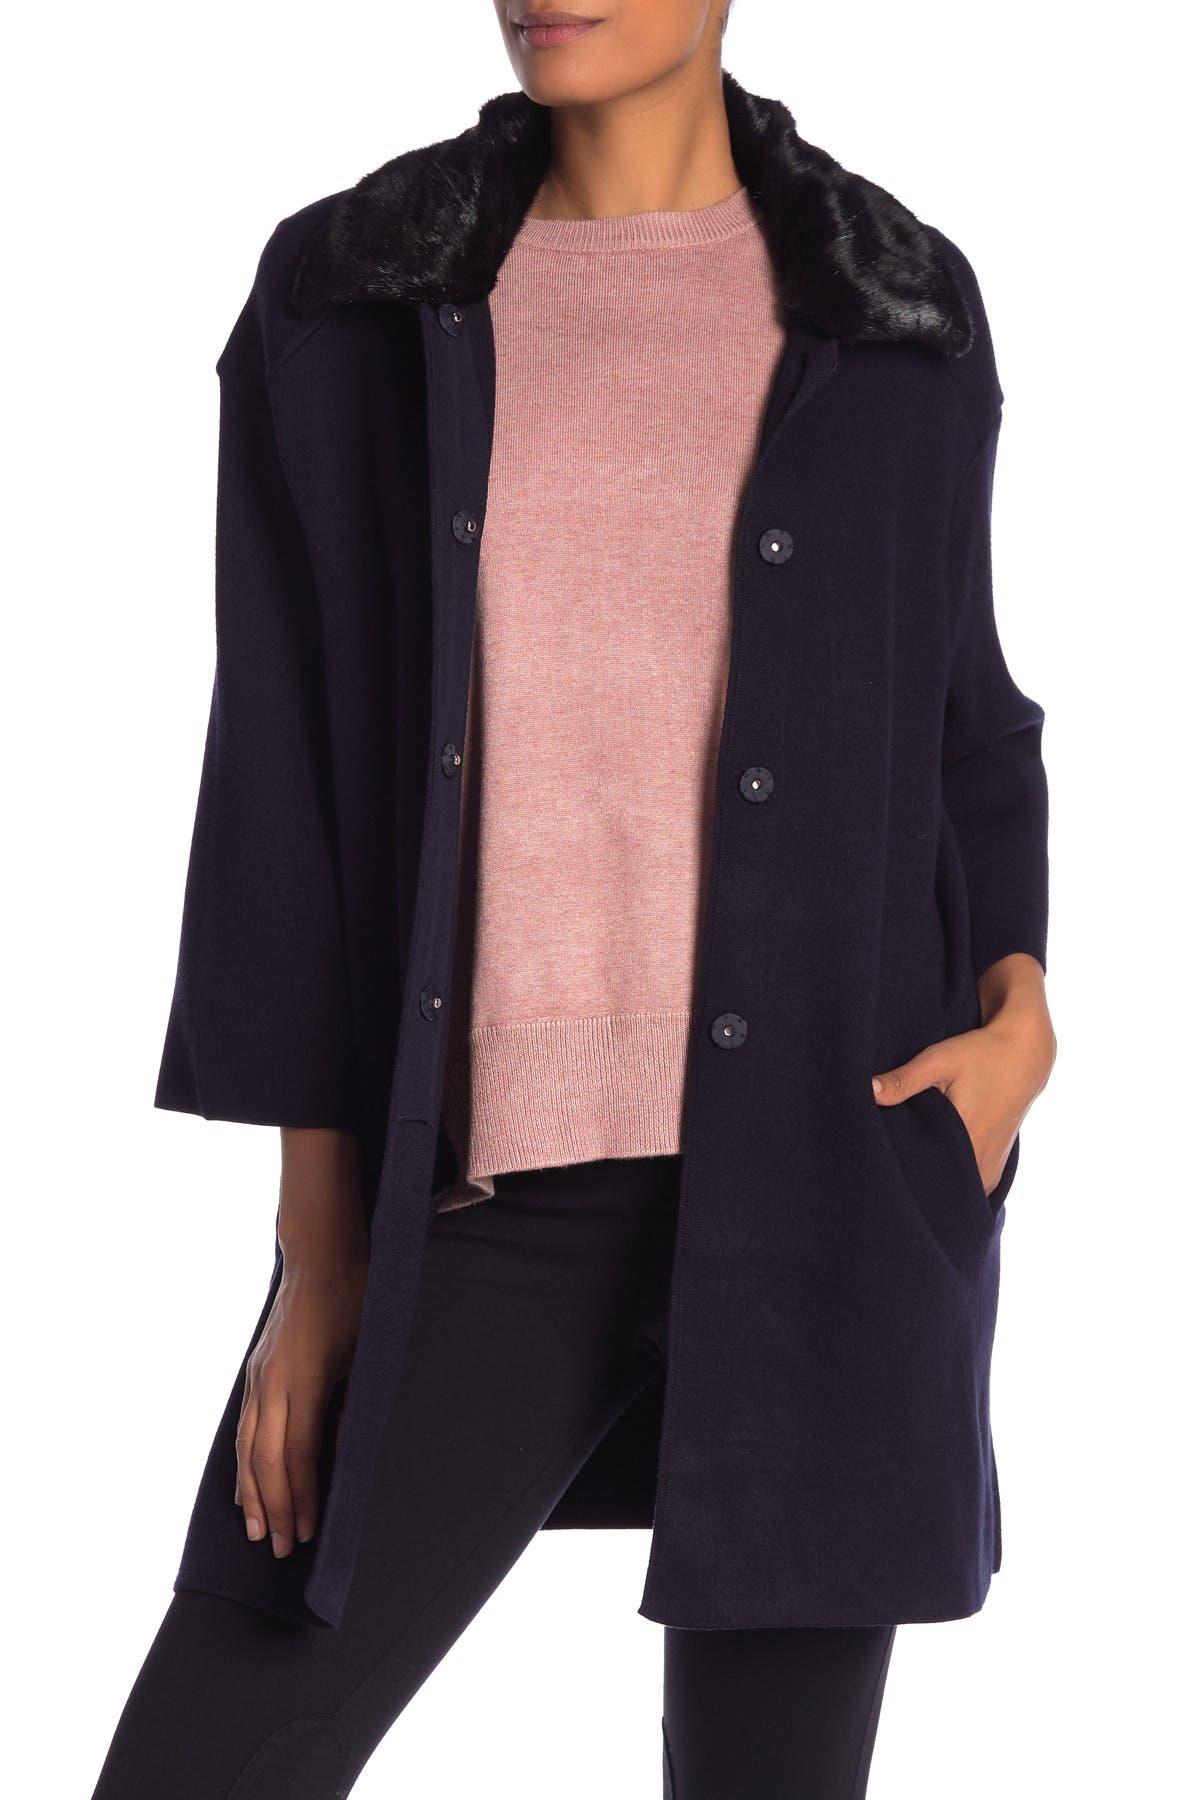 Image of Catherine Catherine Malandrino Faux Fur Collar Snap Down Jacket